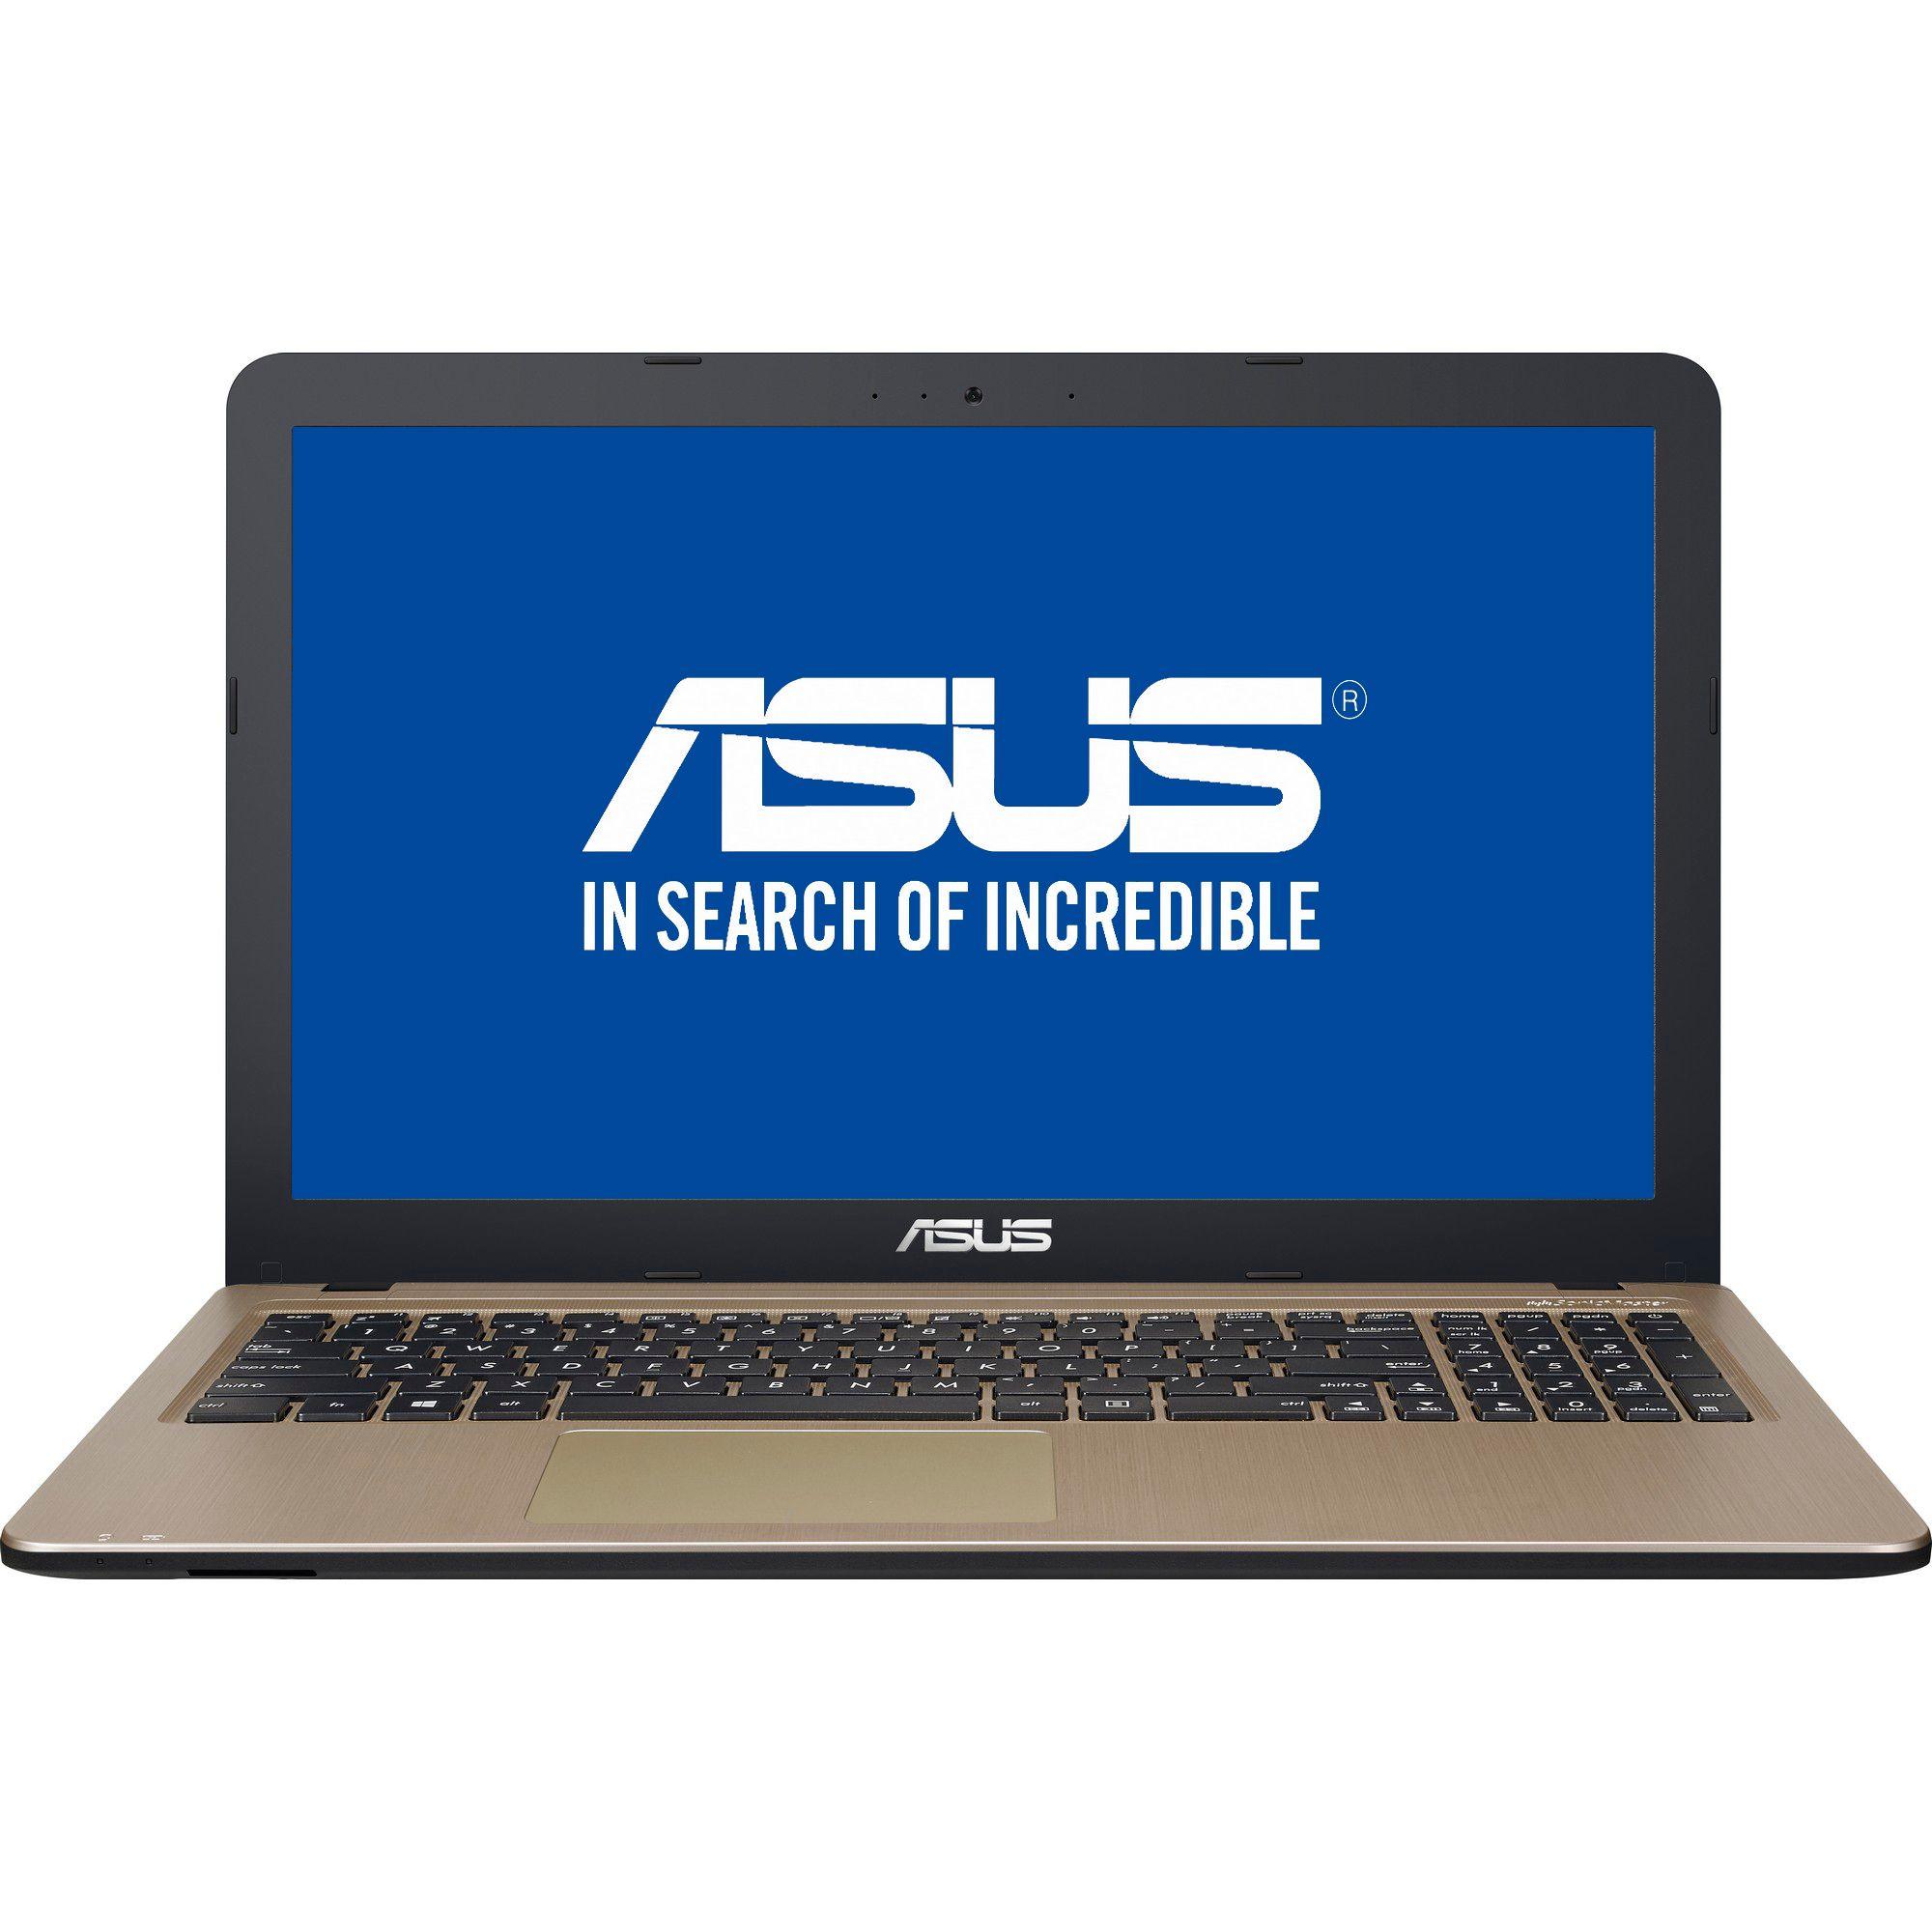 Notebook Asus VivoBook X540UA 15.6 HD Intel Core i3-7100U RAM 4GB HDD 500GB Endless OS